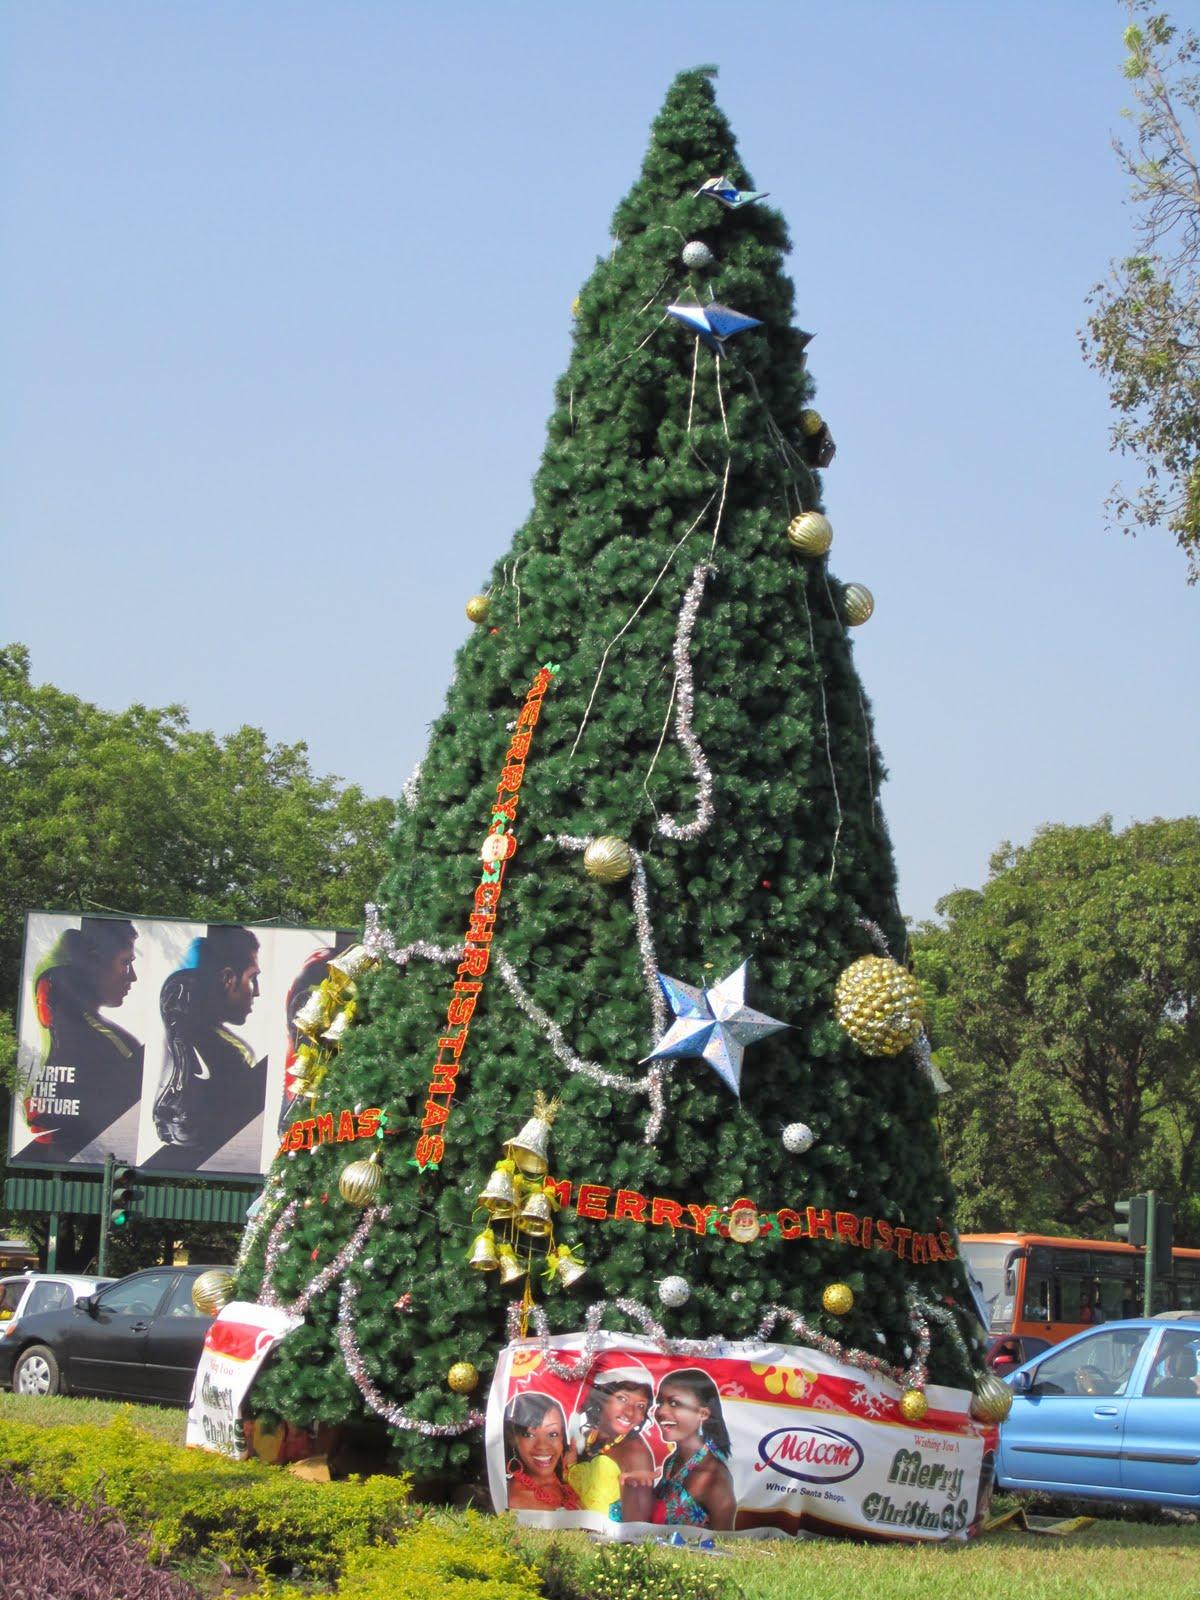 Decorations For Christmas In Ghana : Ghana be serving december